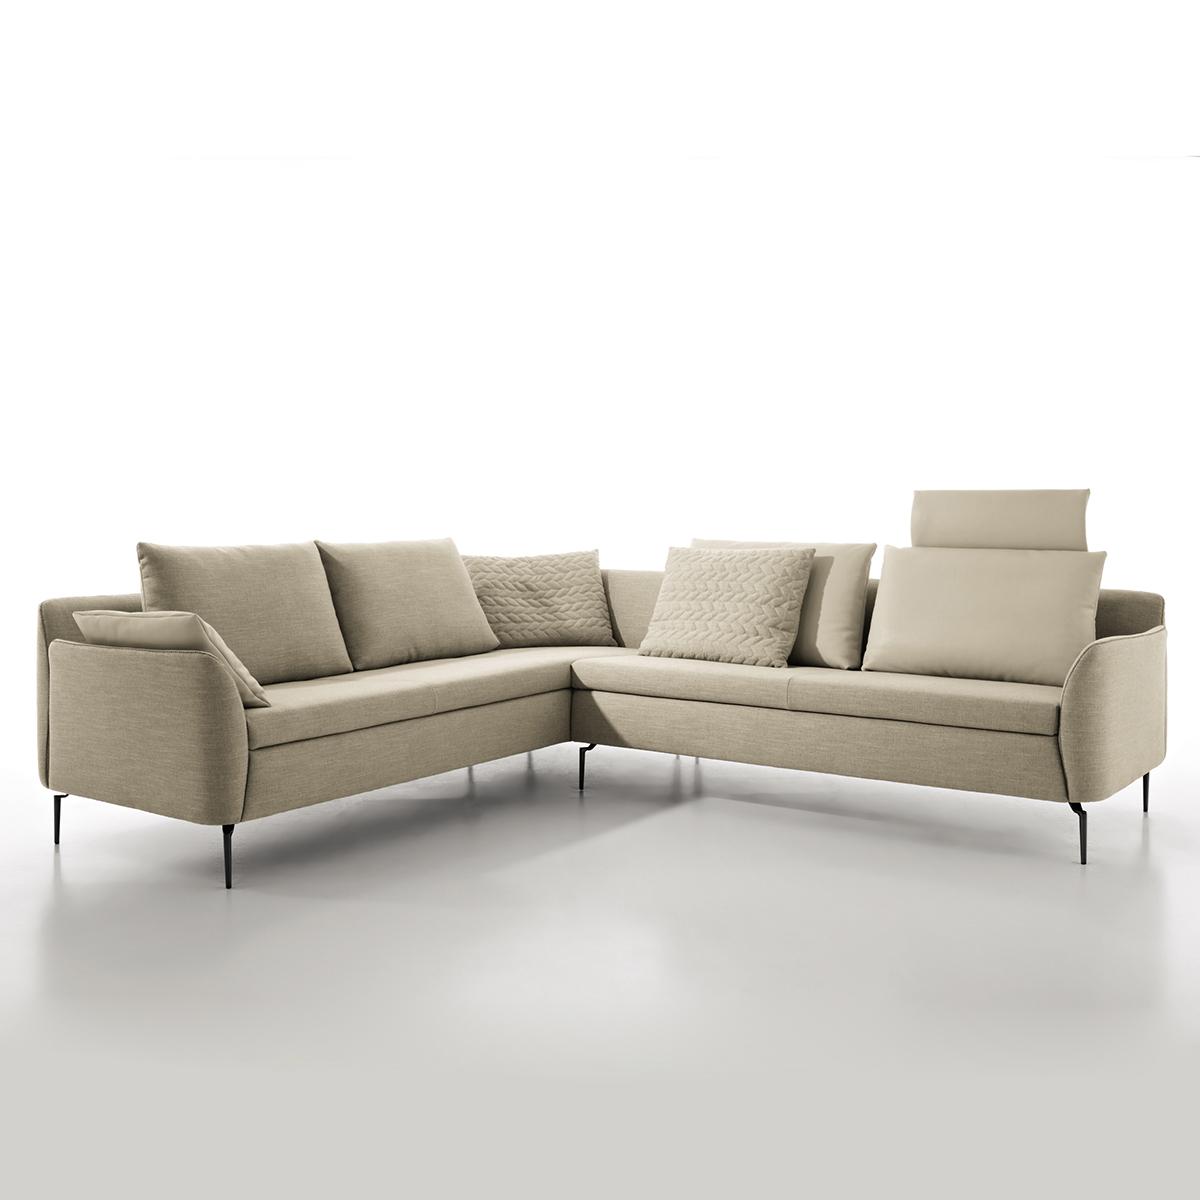 koinor omega ecksofa best koinor sofa modell evita in leder a india omega with koinor omega. Black Bedroom Furniture Sets. Home Design Ideas